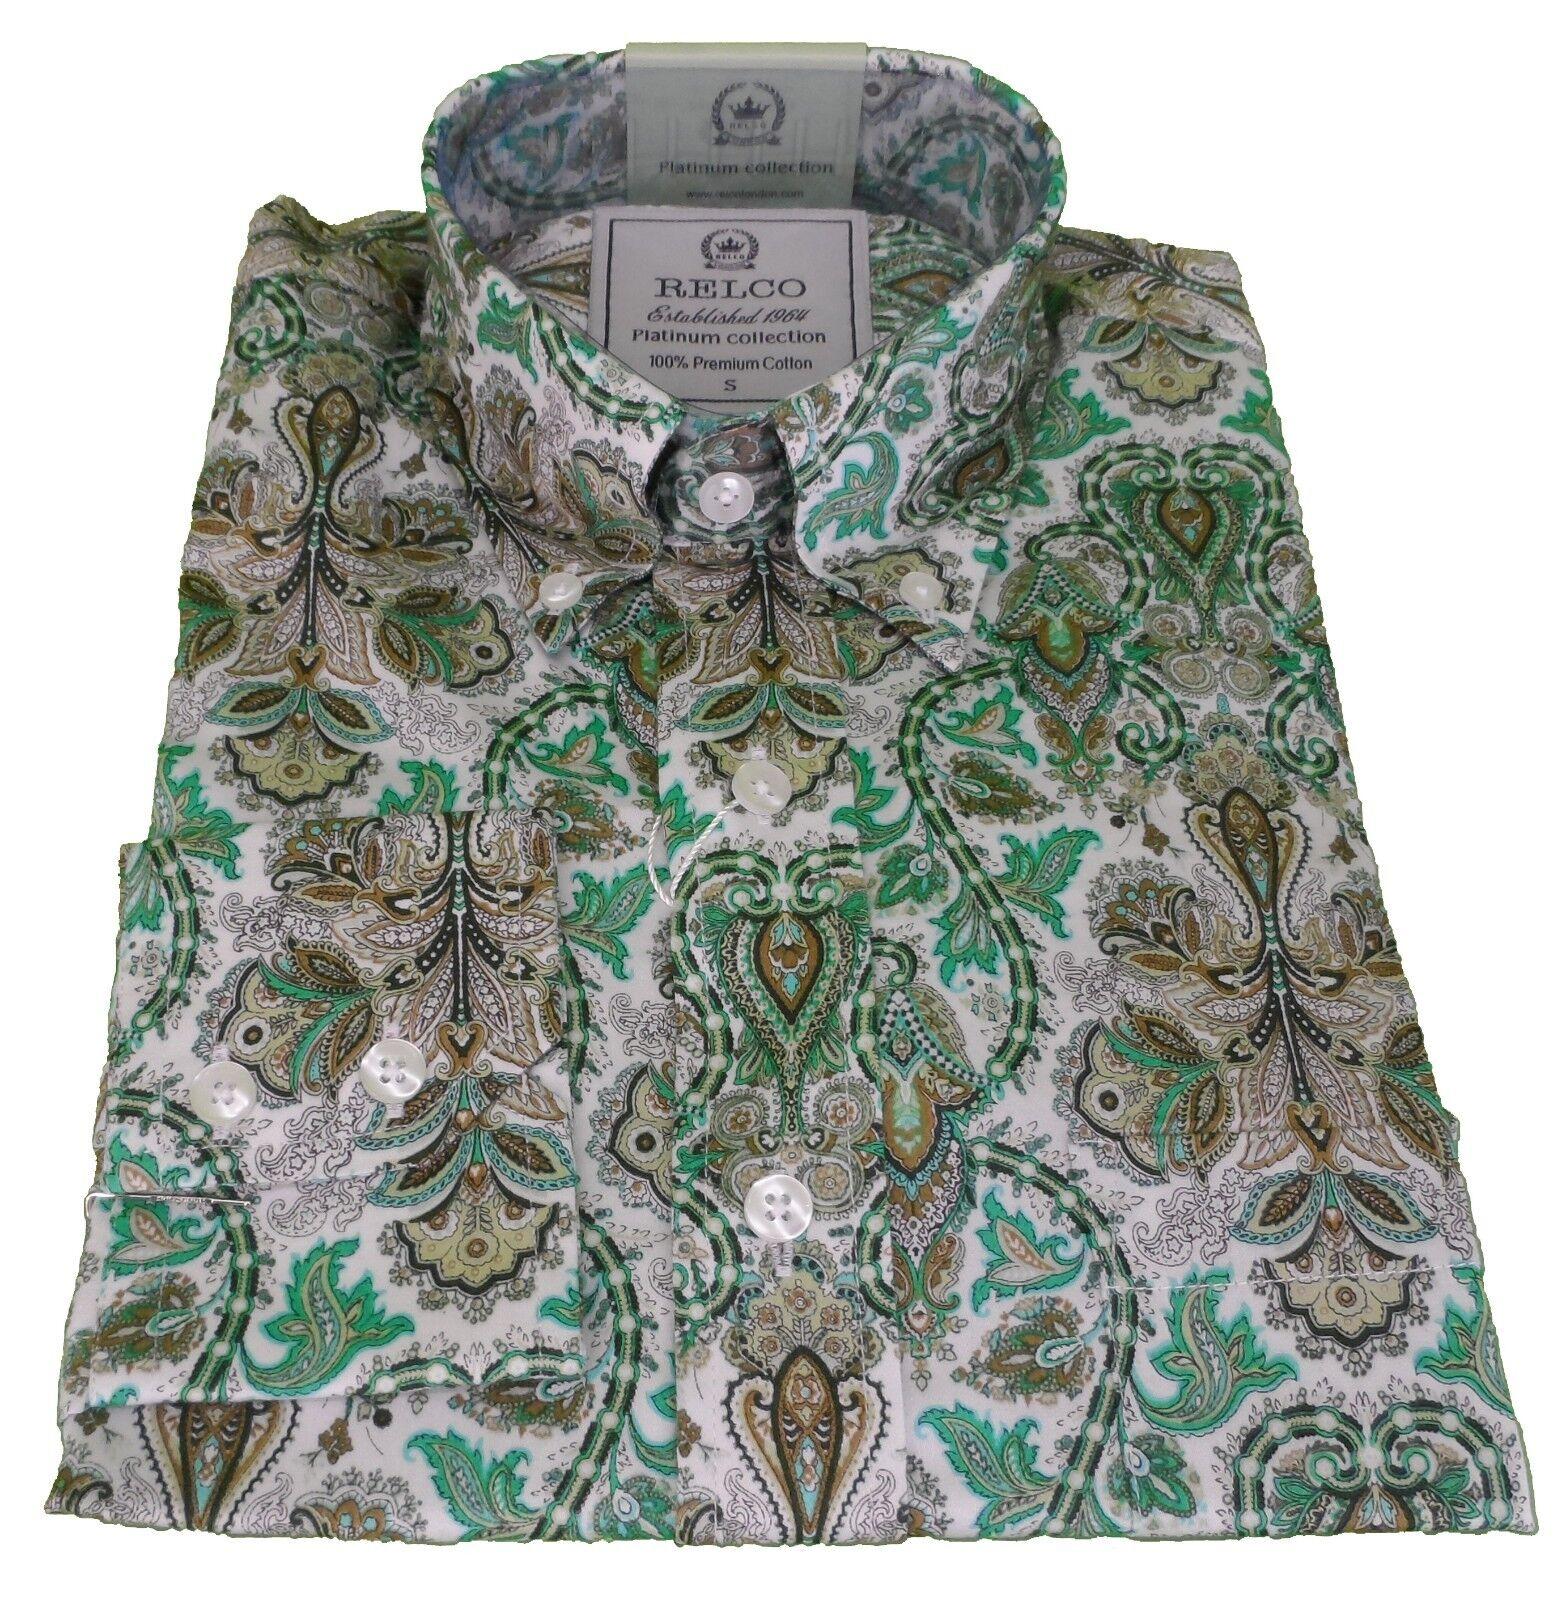 Relco Platinum Bianco verde oro Paisley Raso Cotone Retrò MOD Camicia'S